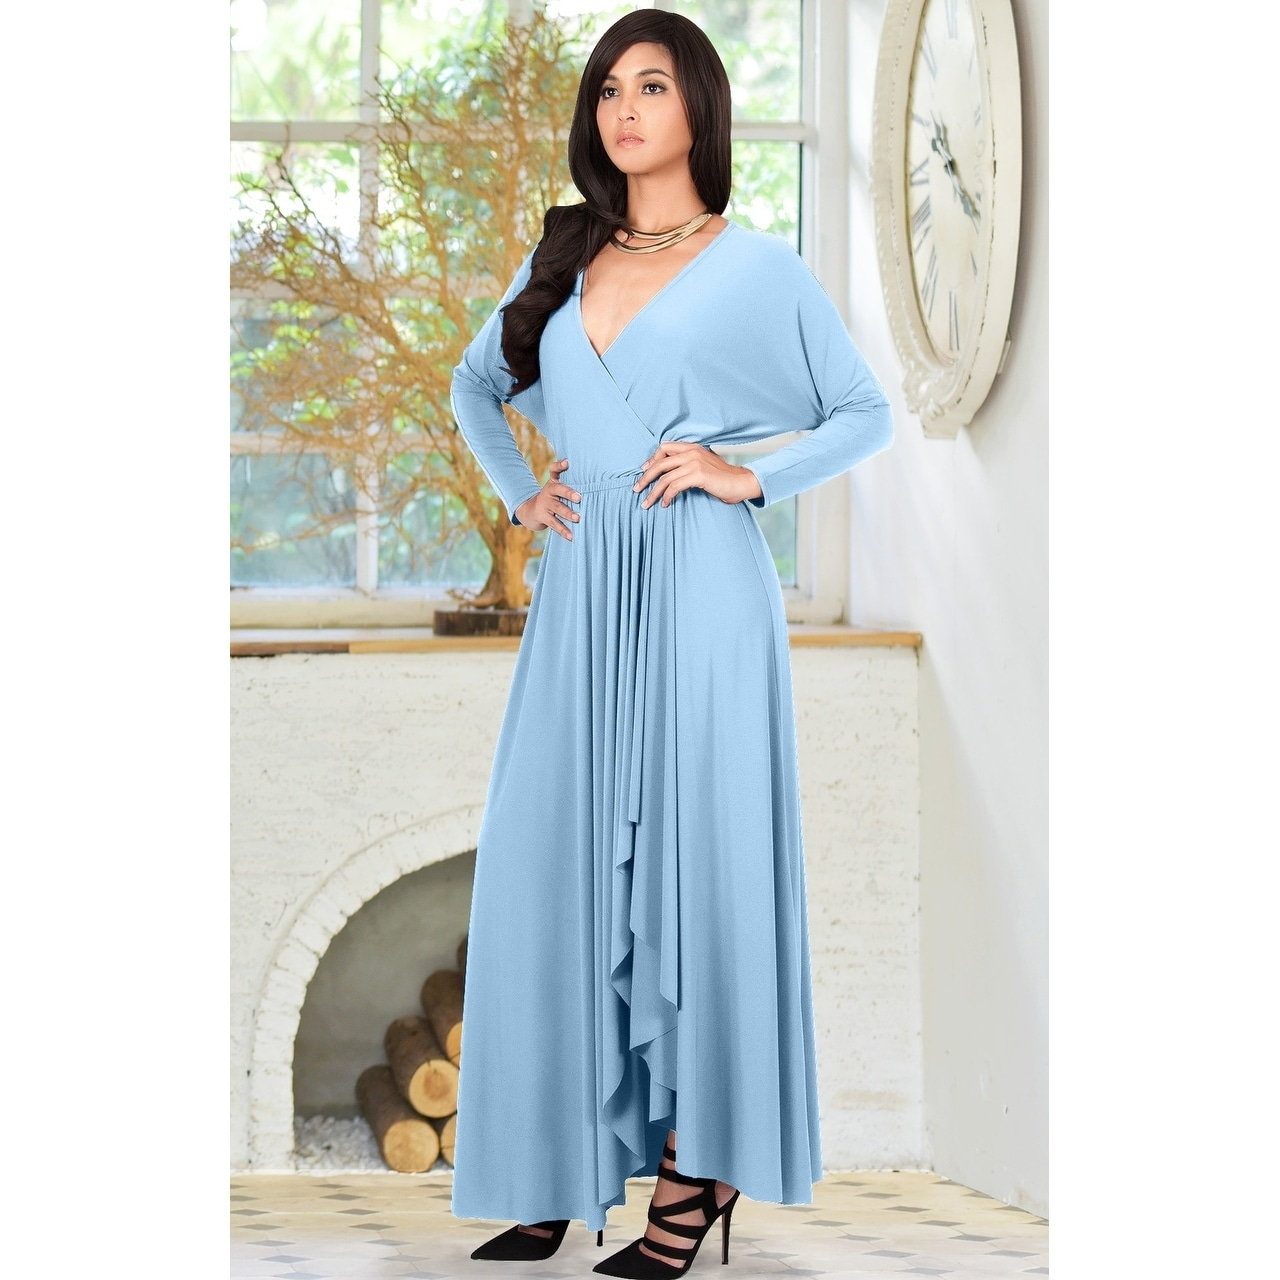 a0c5f7c1c4d KOH KOH Womens Designer Long Sleeve Drape Split Cocktail Maxi Dress